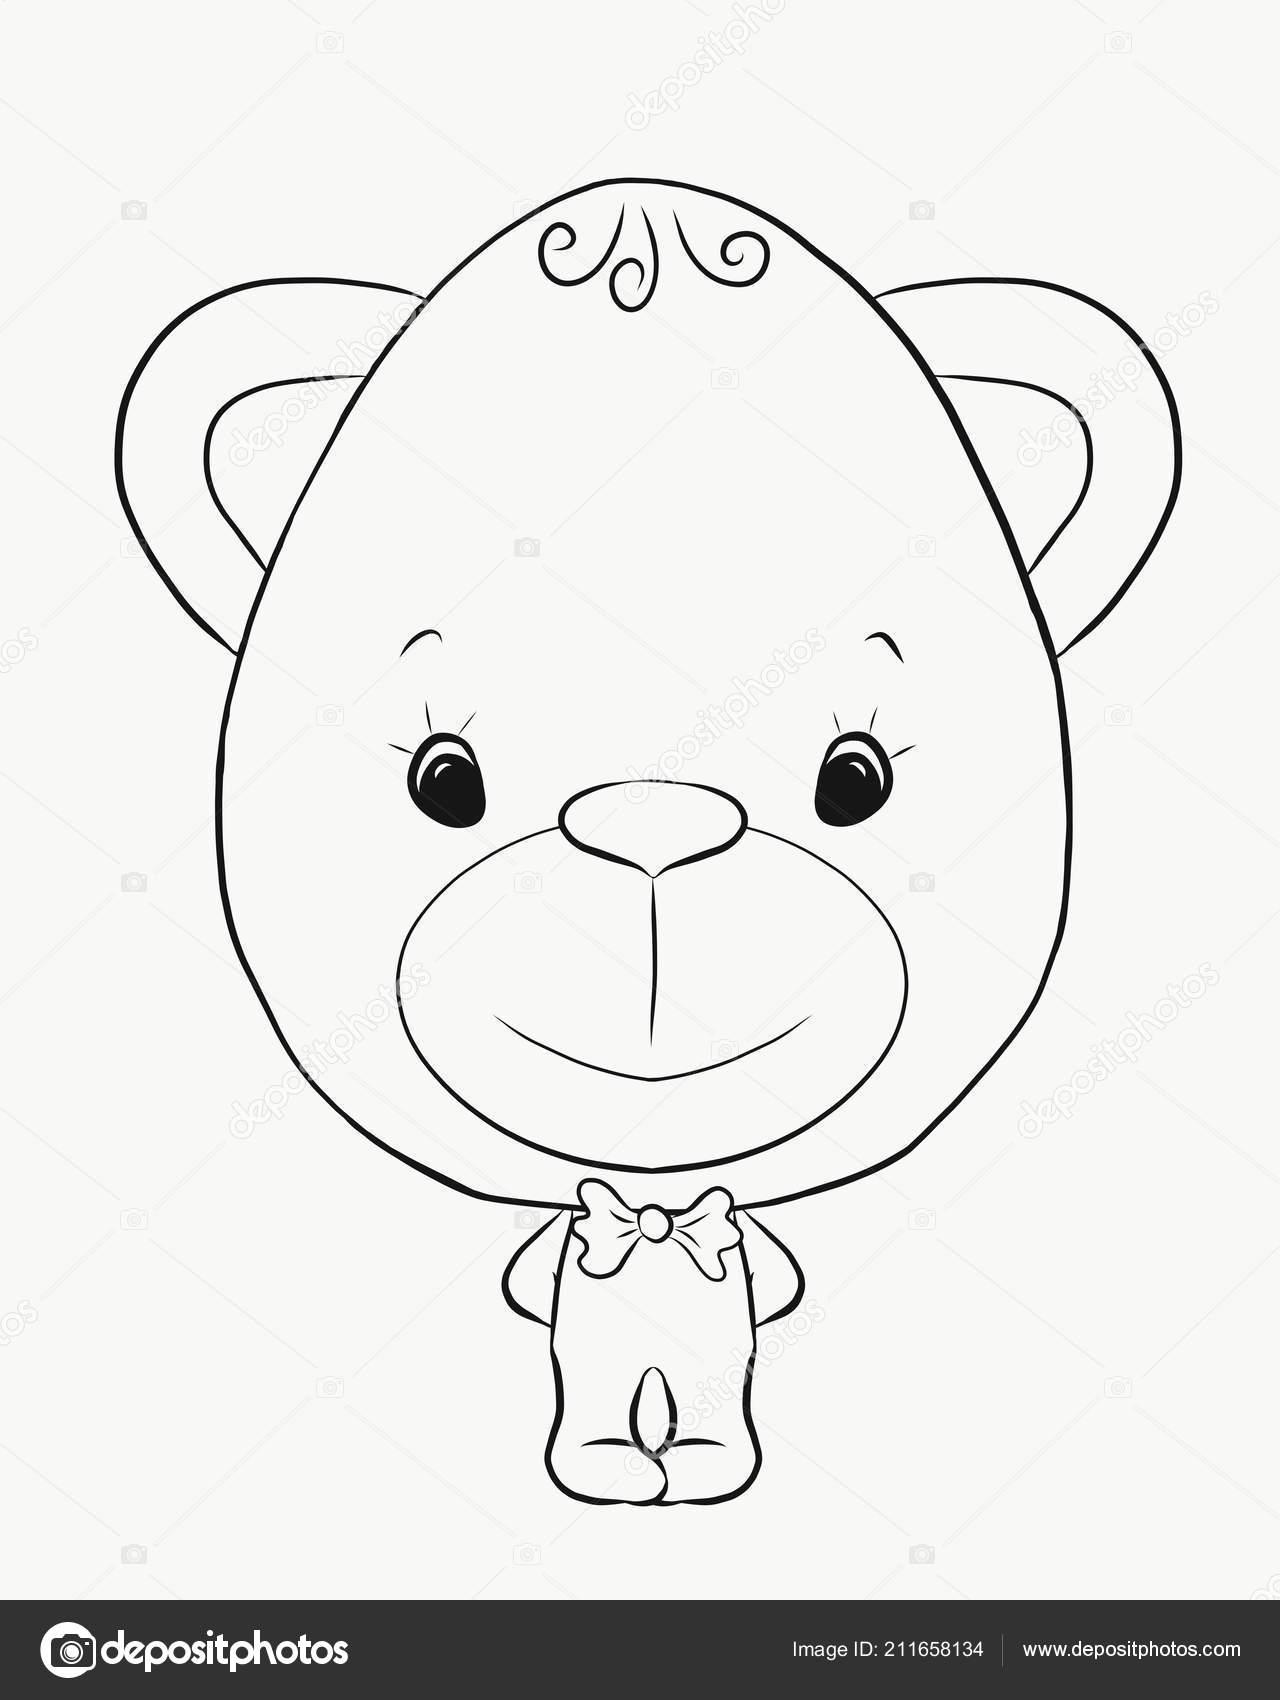 Coloriage Un Garcon.Coloriage Garcon Petit Funny Bear Photographie Yuliya Nazaryan